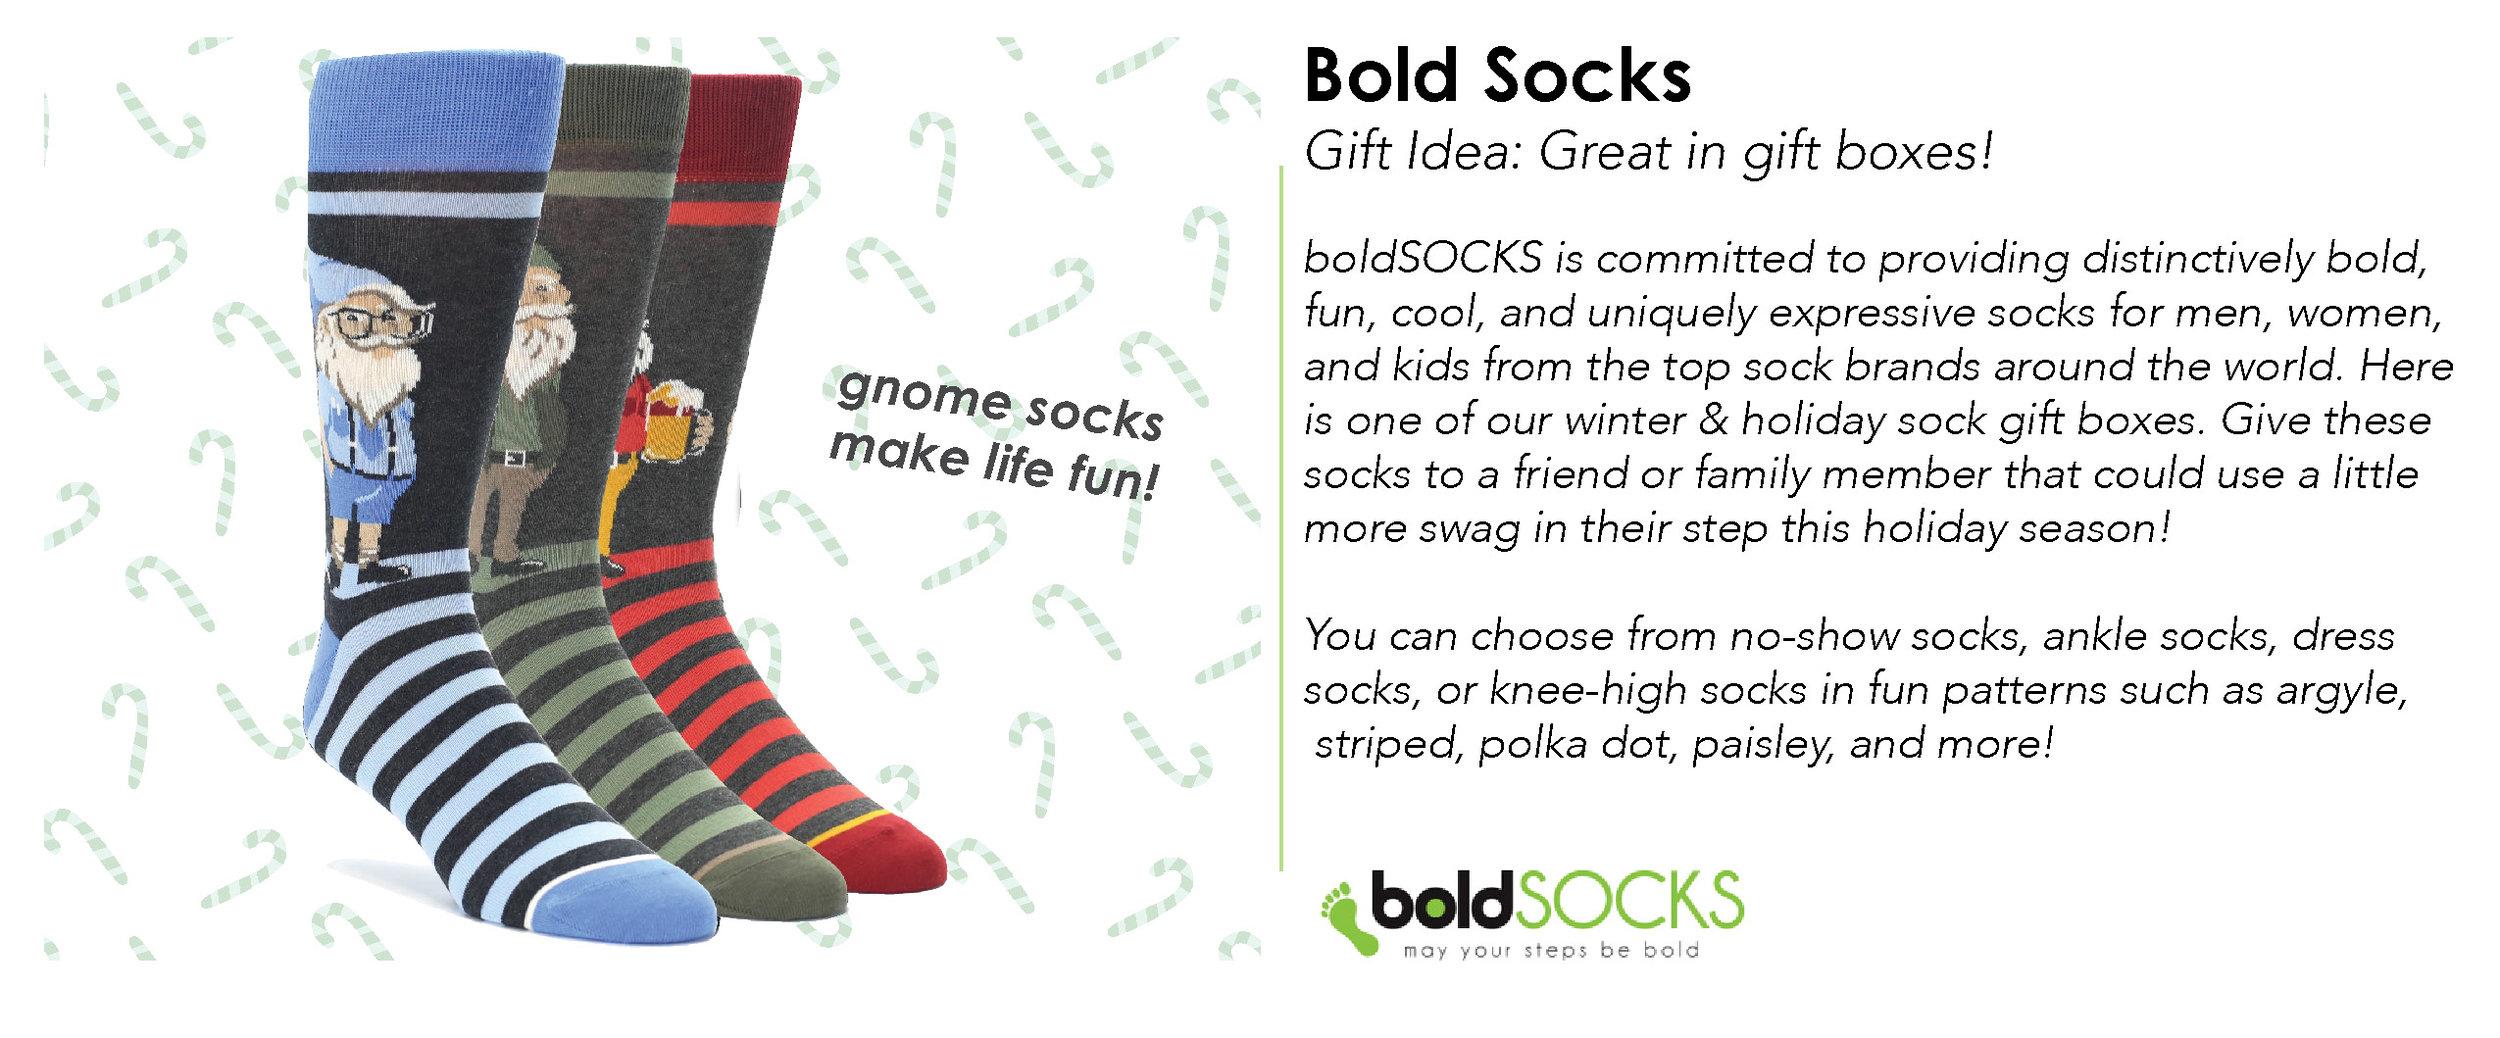 Photo Credit: boldSOCKS - Shop the Look:  boldSocks Website